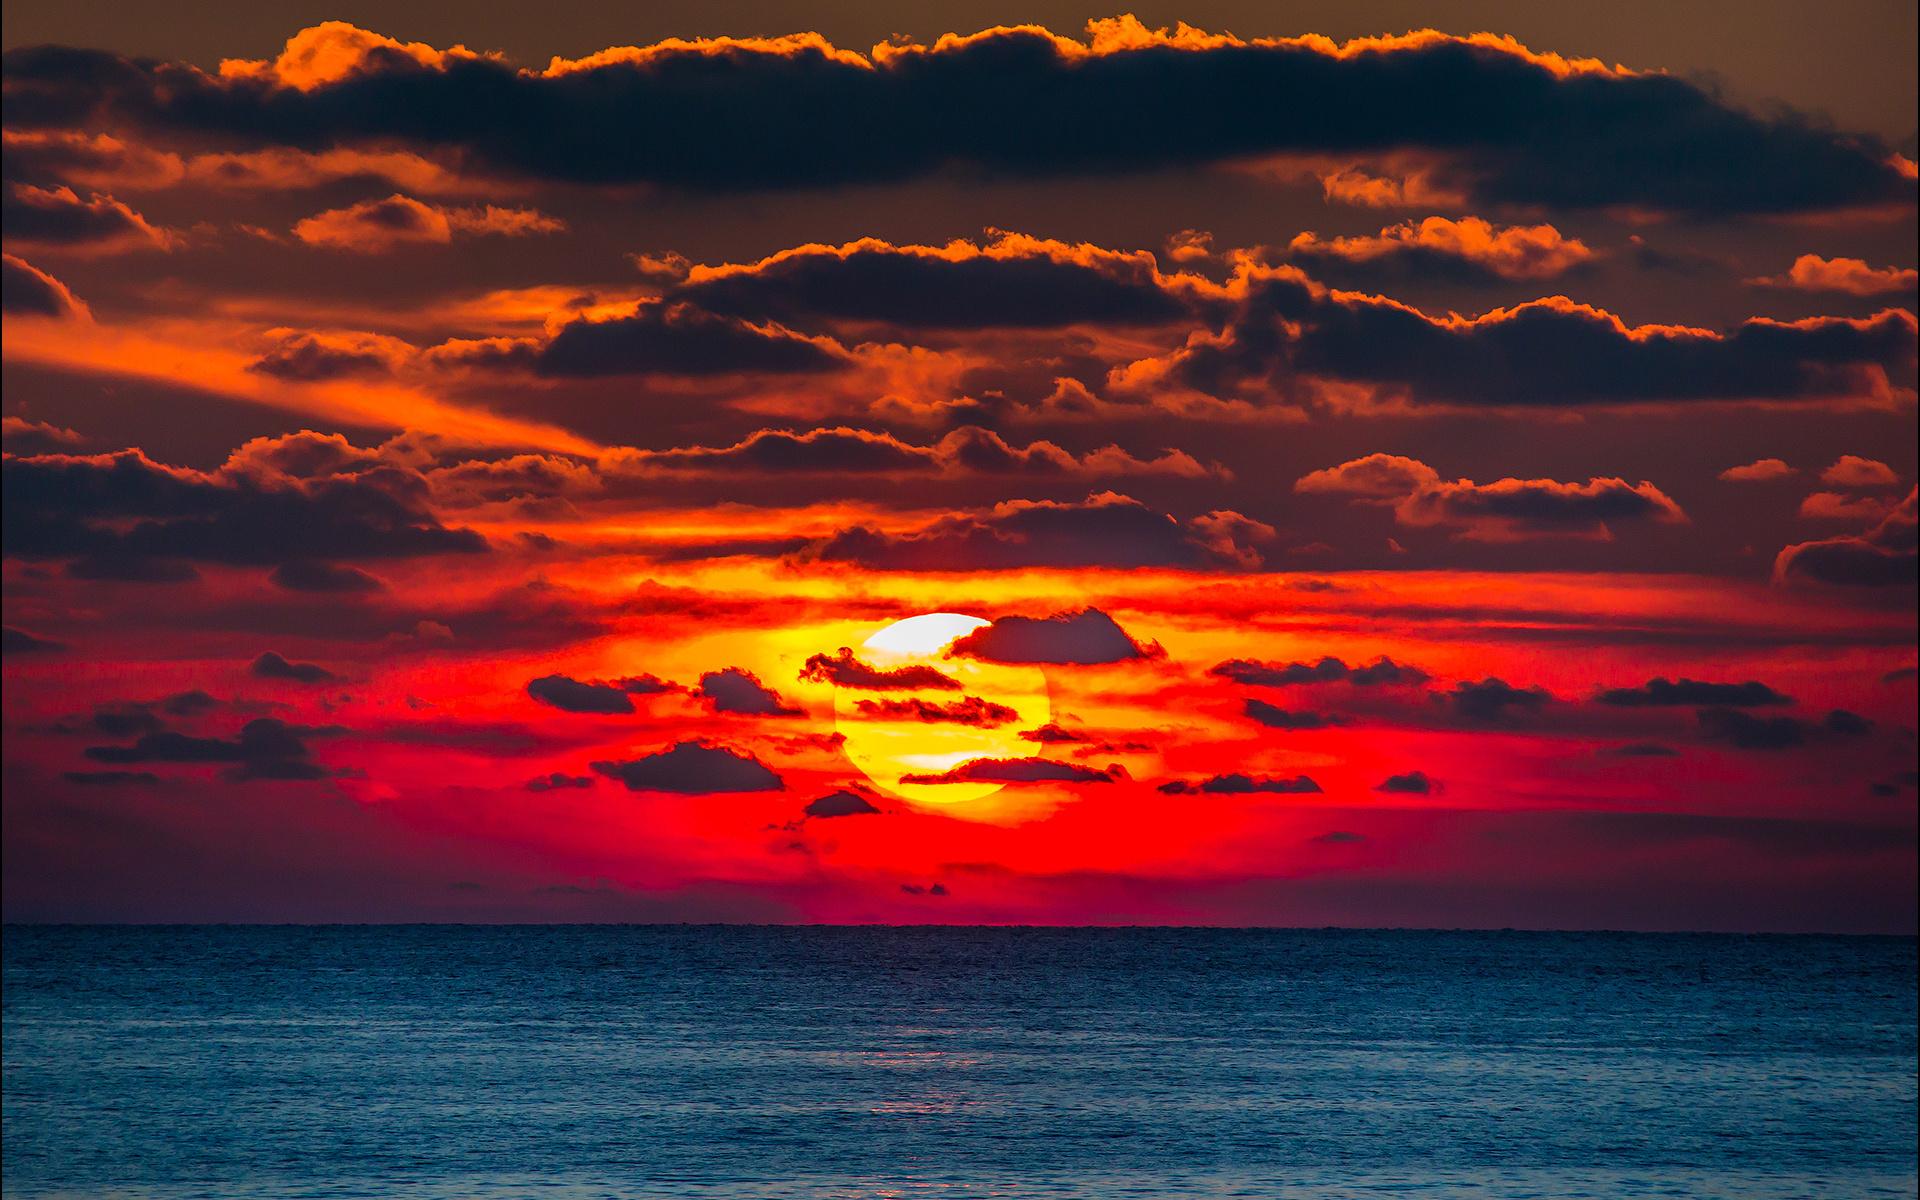 картинки оранжевое небо оранжевое море видео